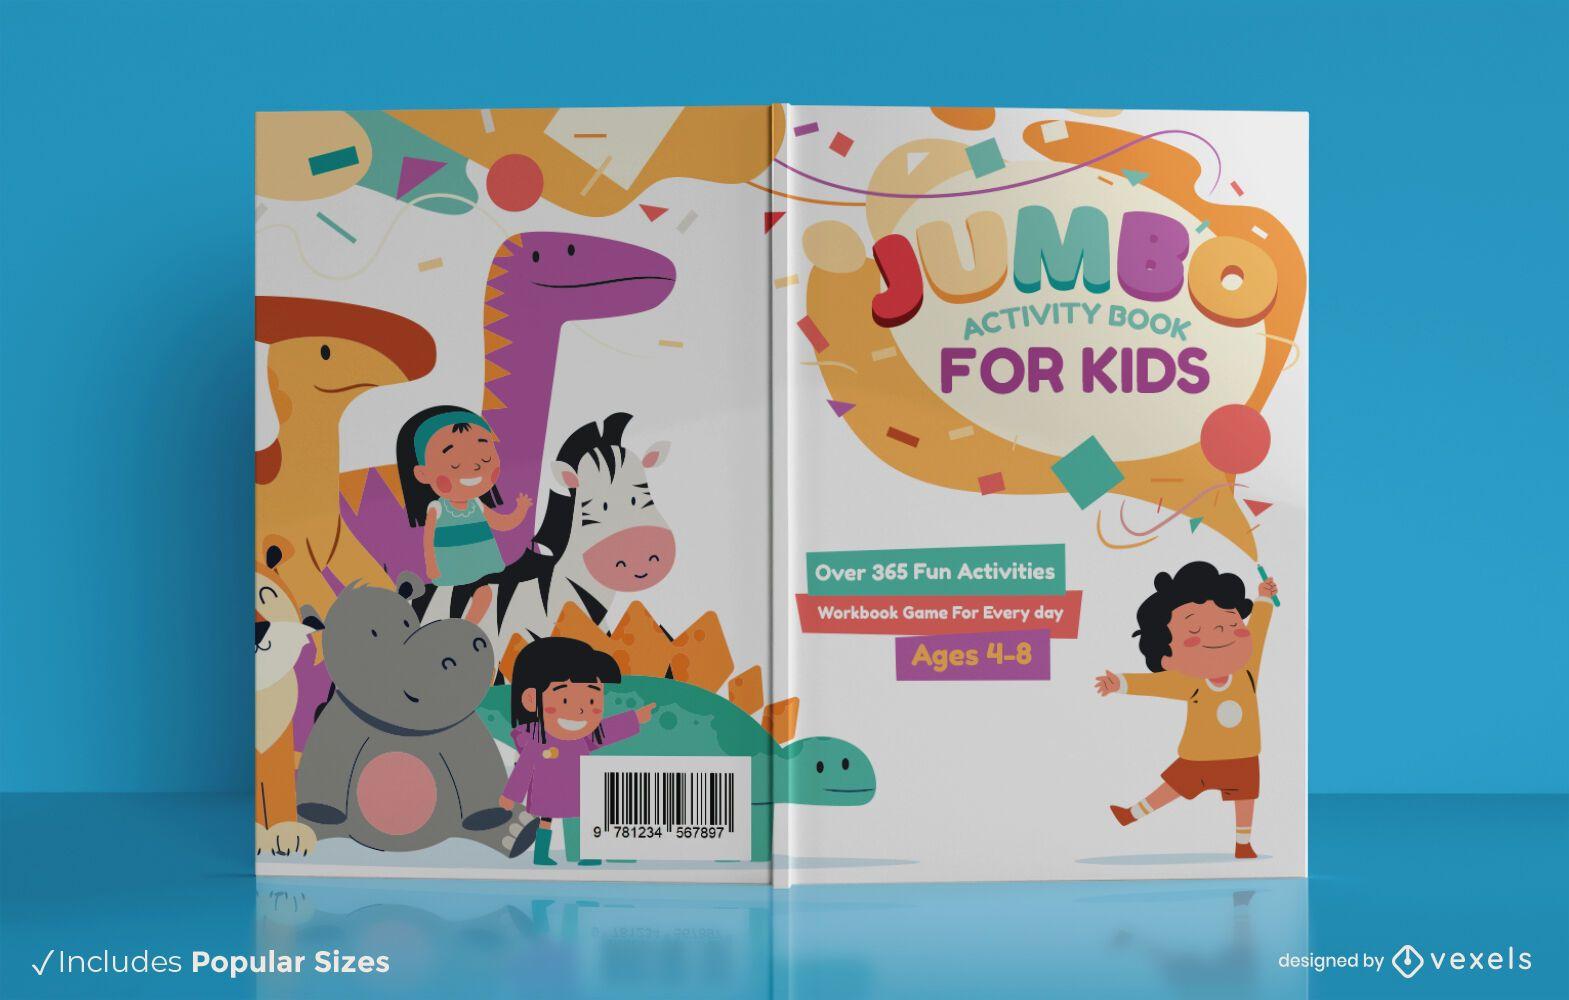 Jumbo activity book cover design